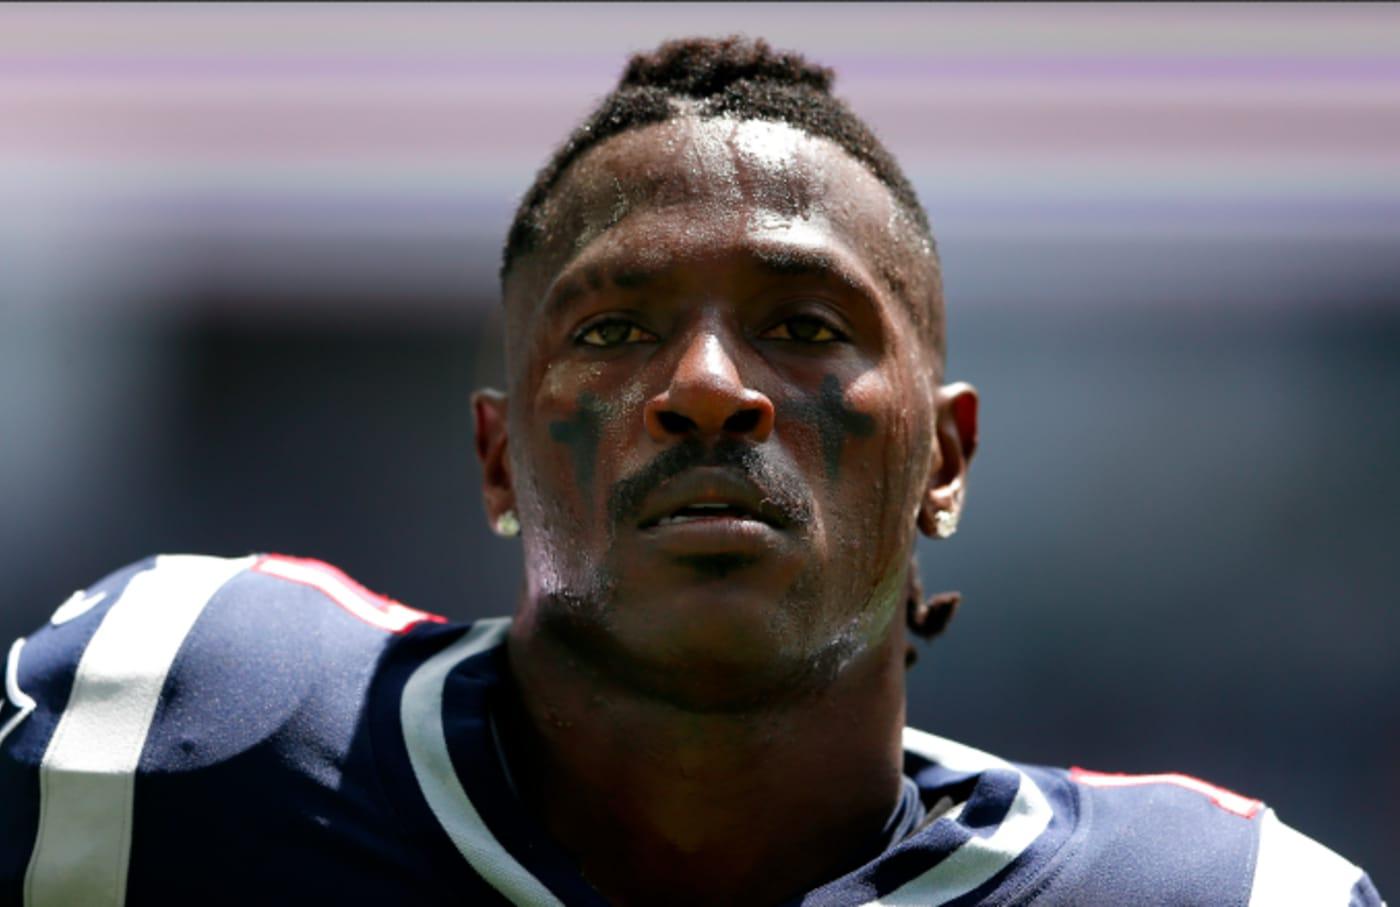 Antonio Brown #17 of the New England Patriots